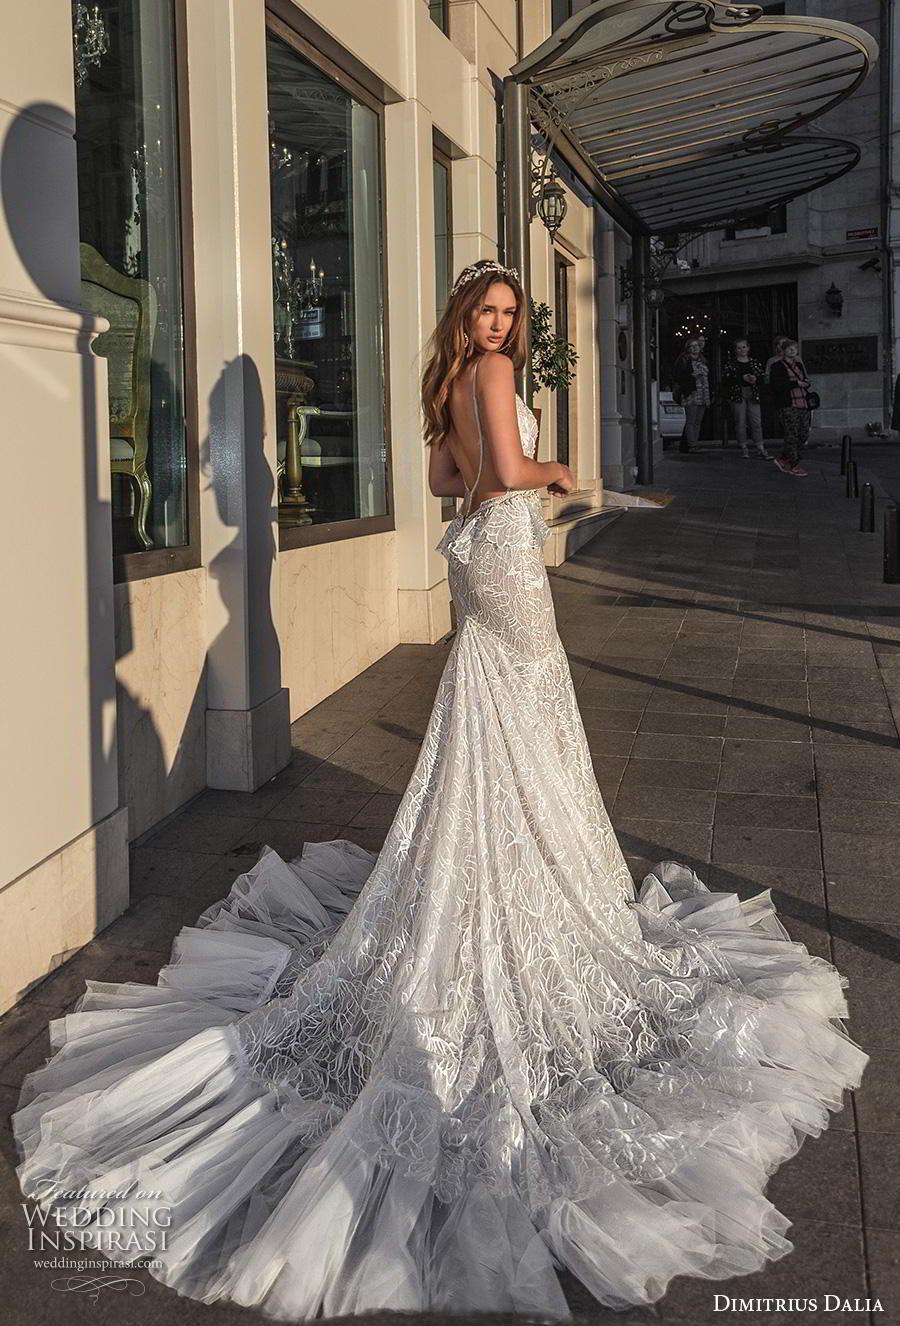 dimitrius dalia 2019 bridal sleeveless spaghetti strap deep sweetheart neckline full embellishment peplum elegant glamorus mermaid wedding dress backless low back chapel train (12) bv